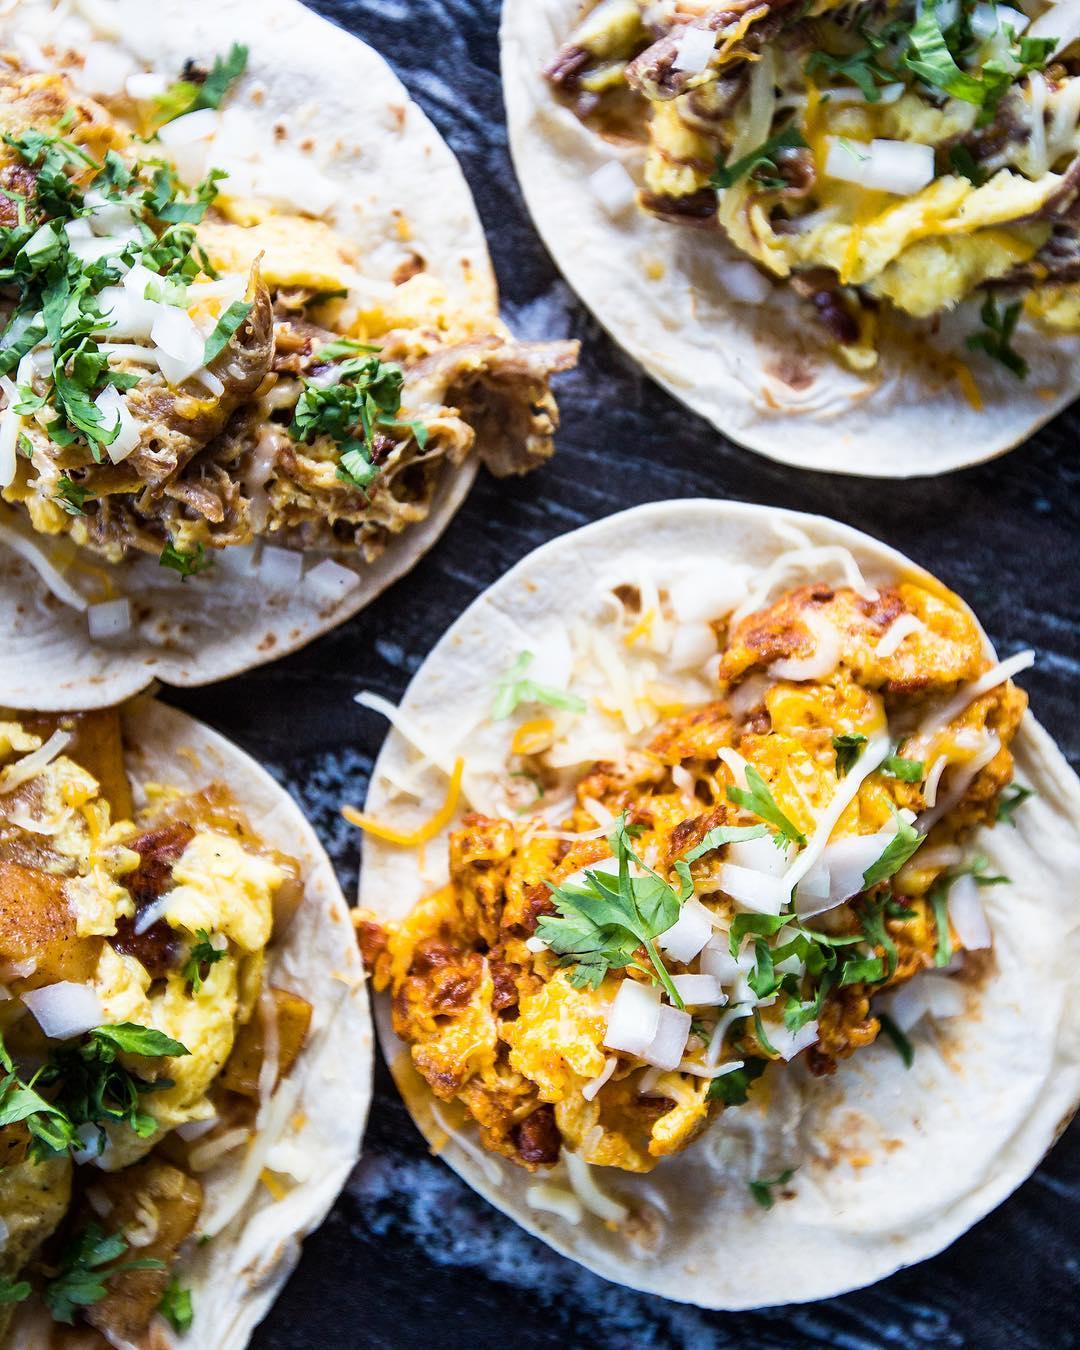 breakfast+tacos+houston+texas.jpg